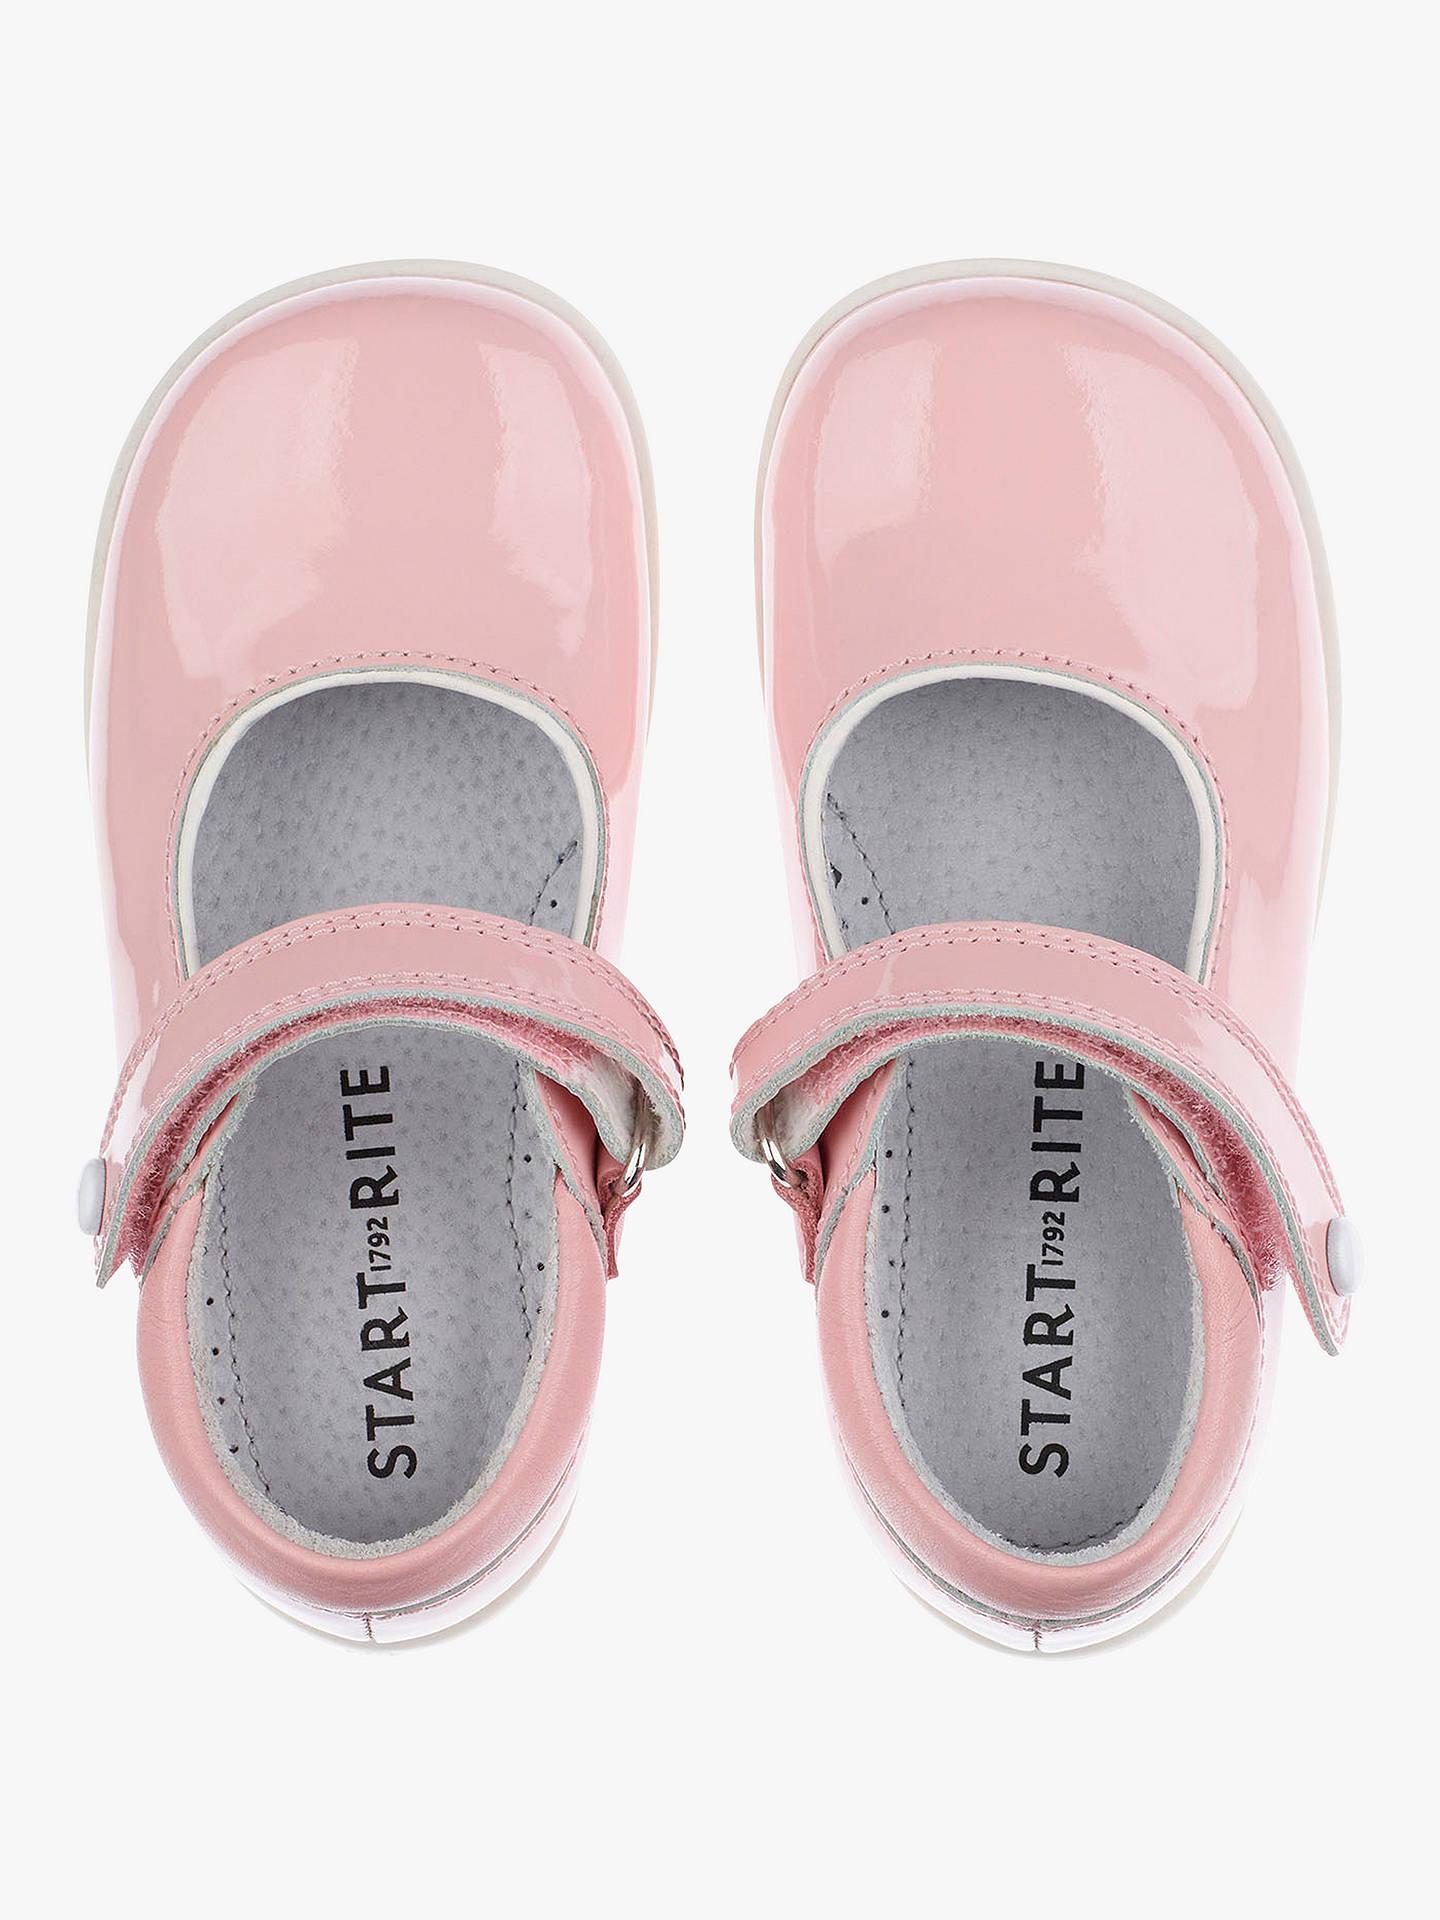 Girls Start rite slipper boots      F FITTING